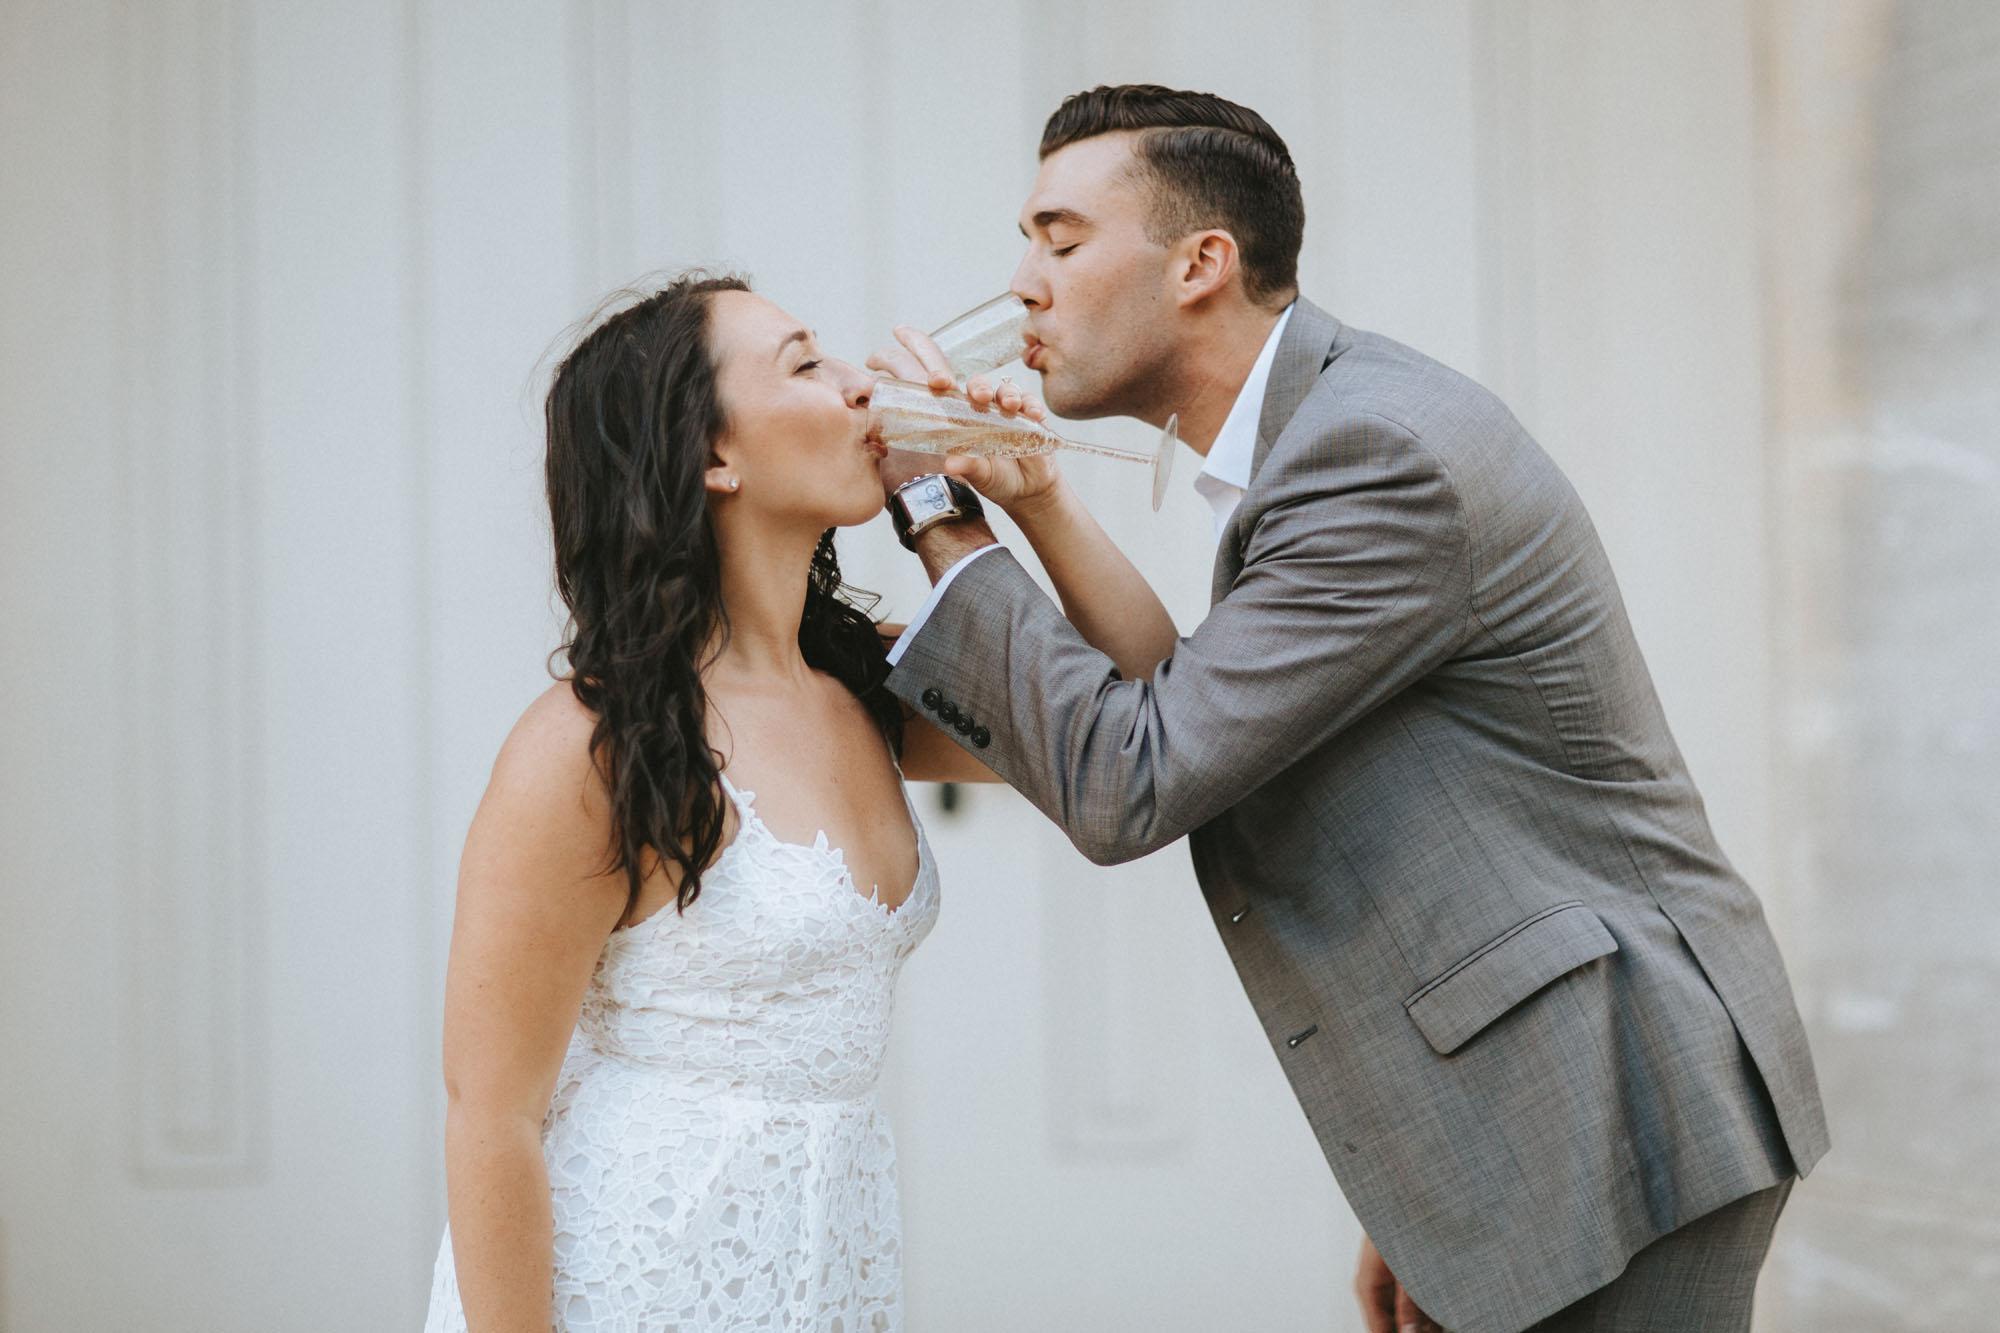 Twisted-Oaks-Studio-Shannon-Billy-Engagement-75.jpg